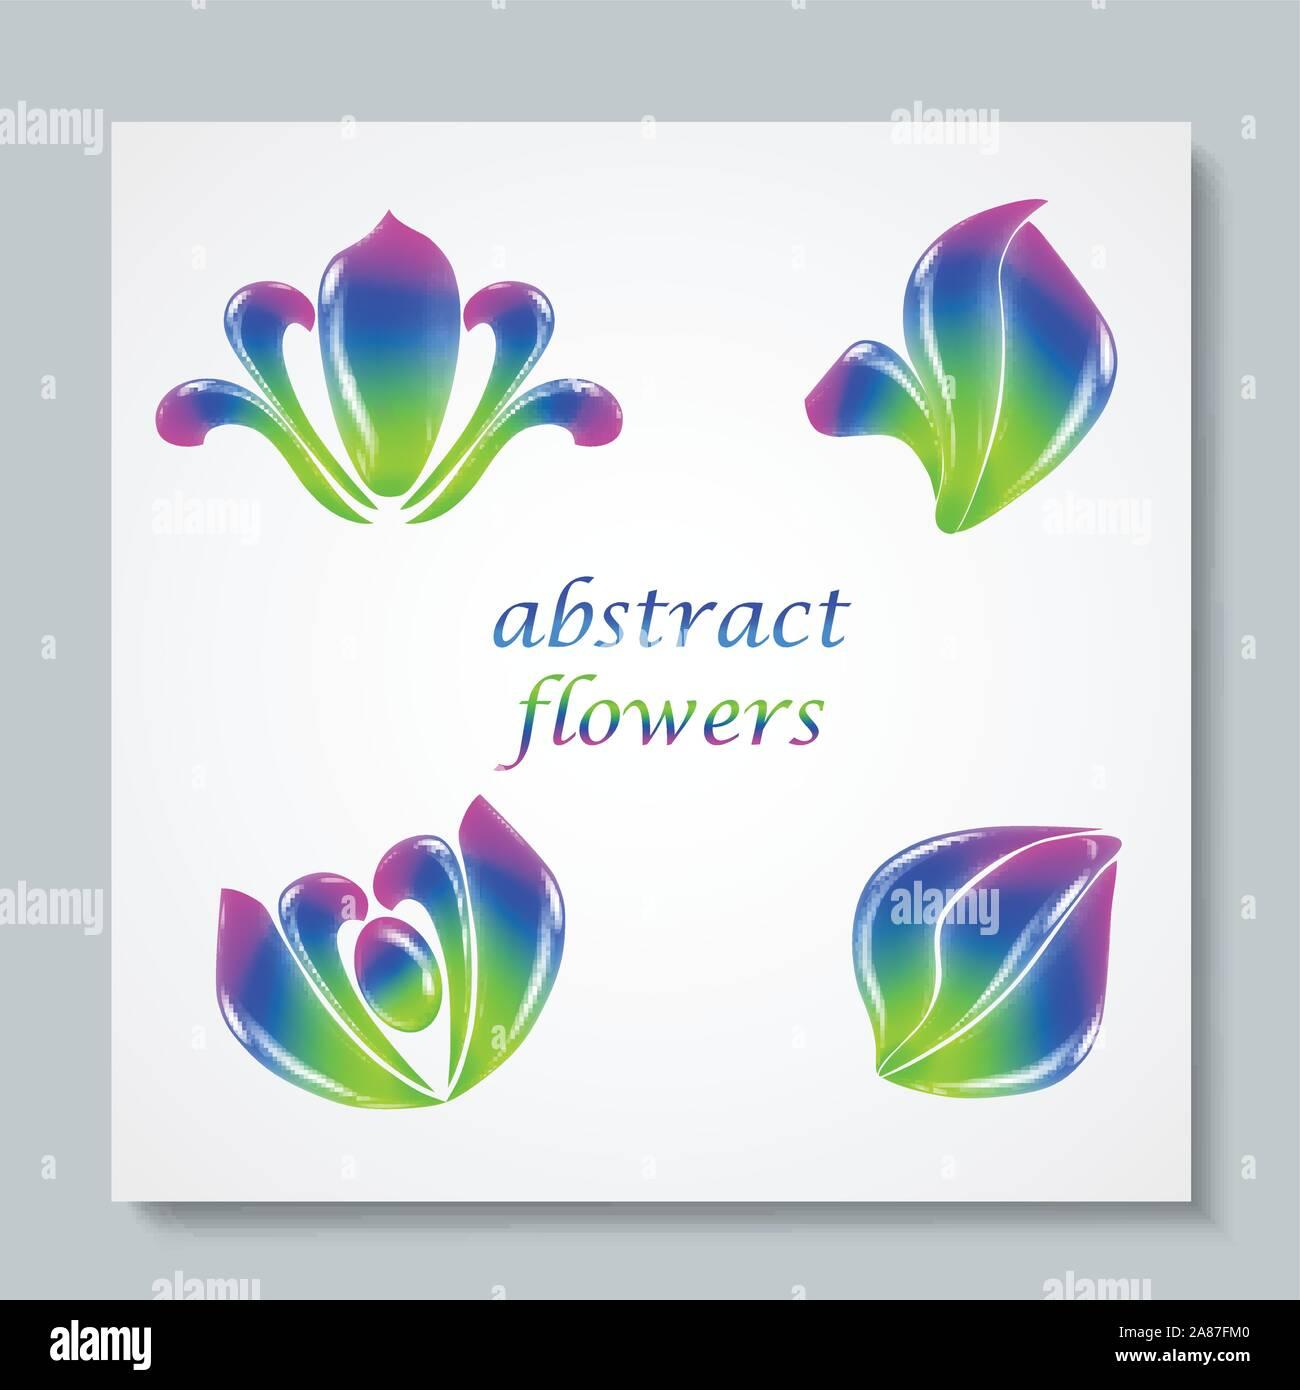 Luxury image logo Rainbow Abstract Flowers Set. Vector illusration Stock Vector